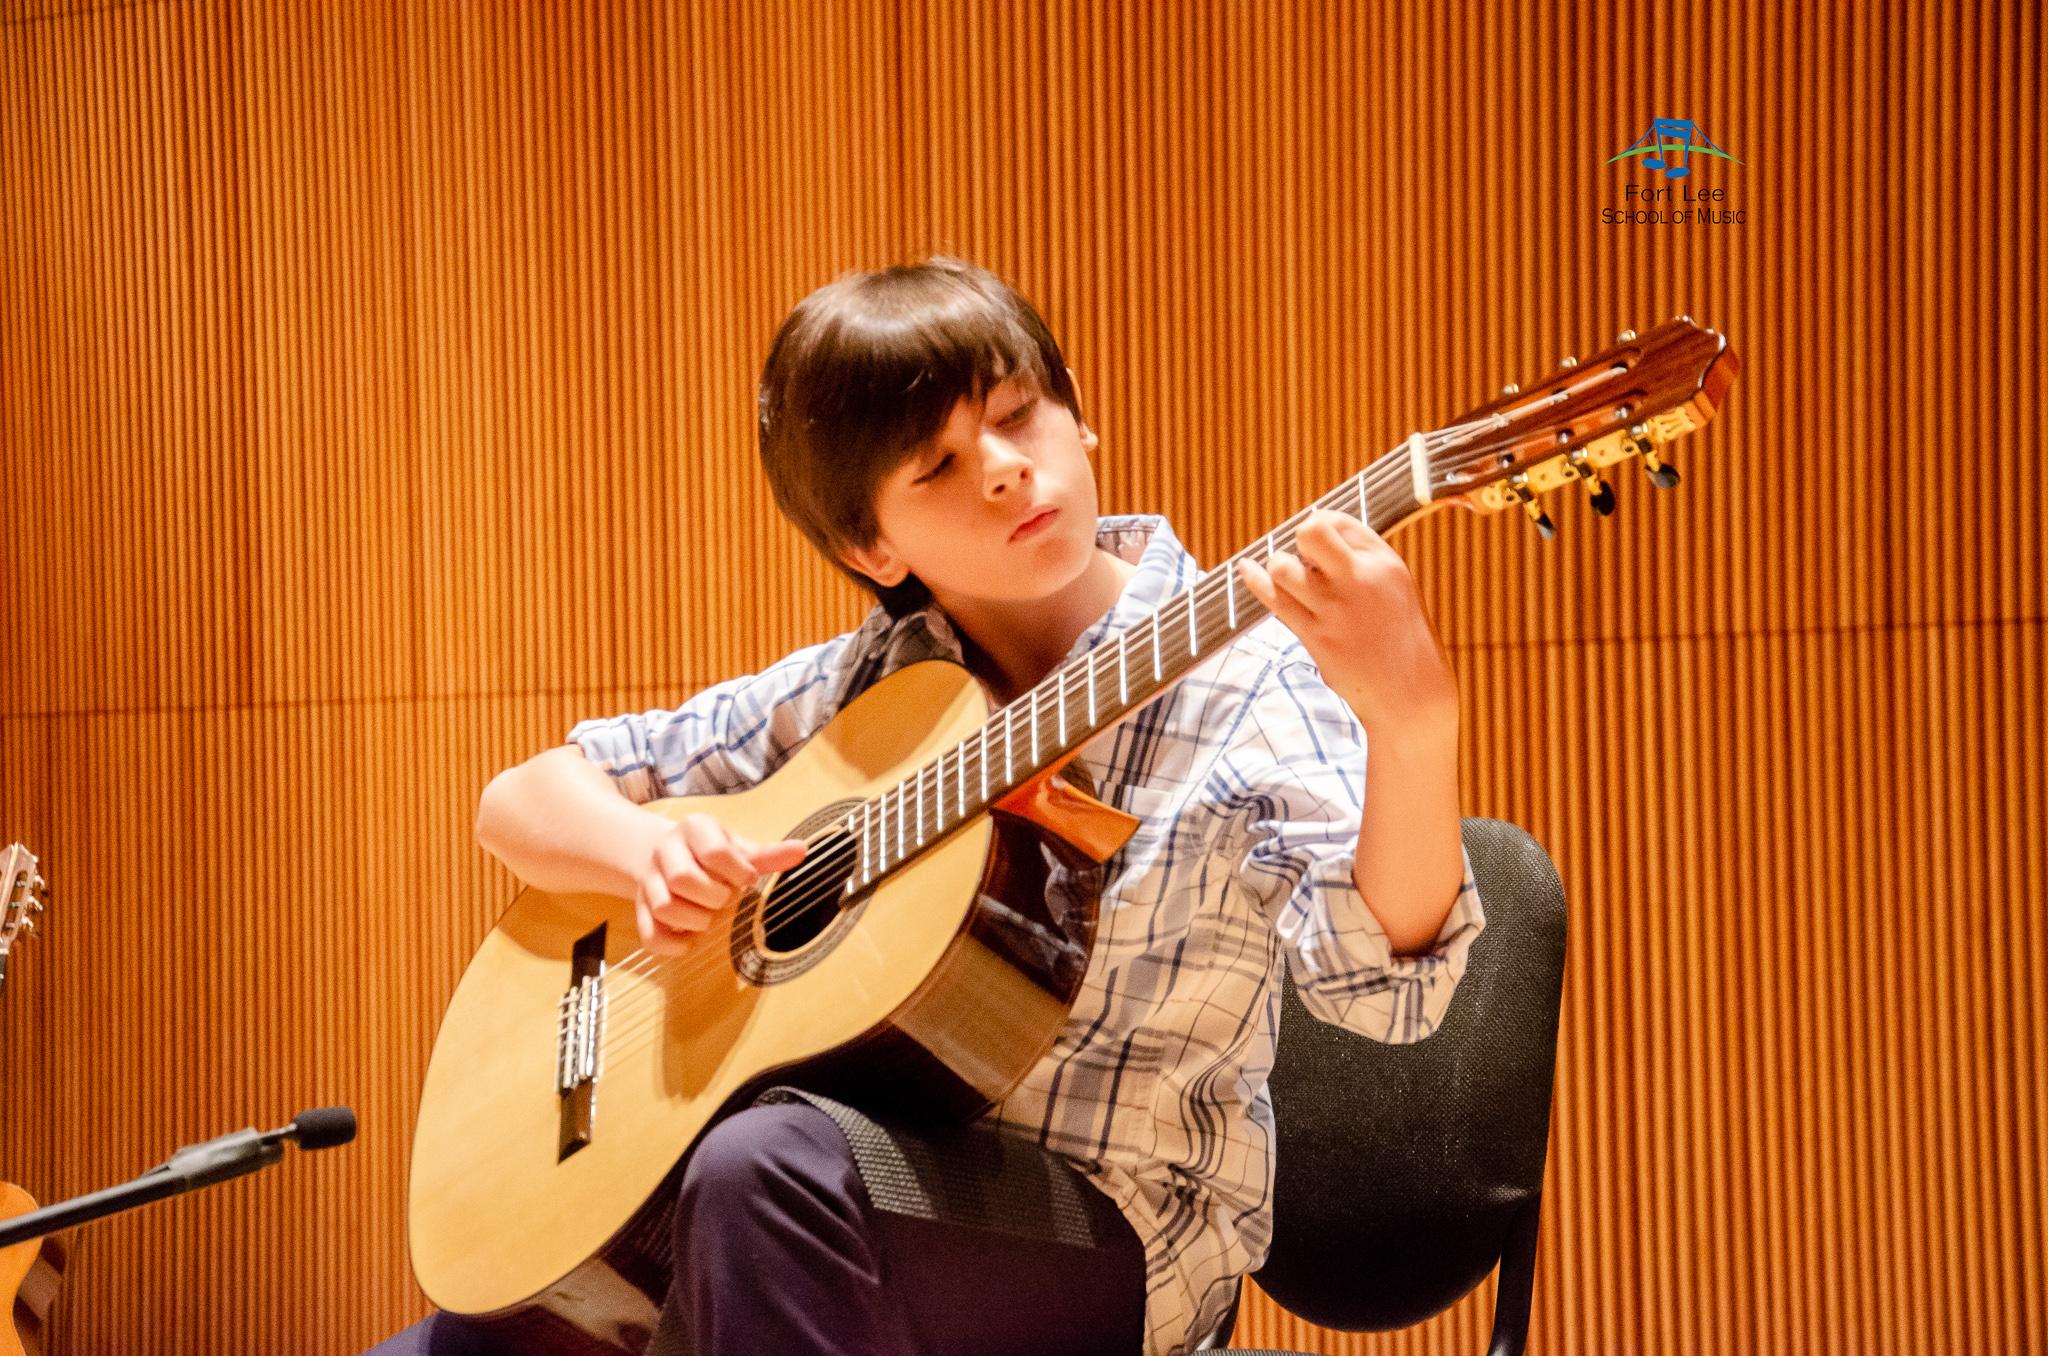 guitar-lessons-englewood-cliffs.jpg